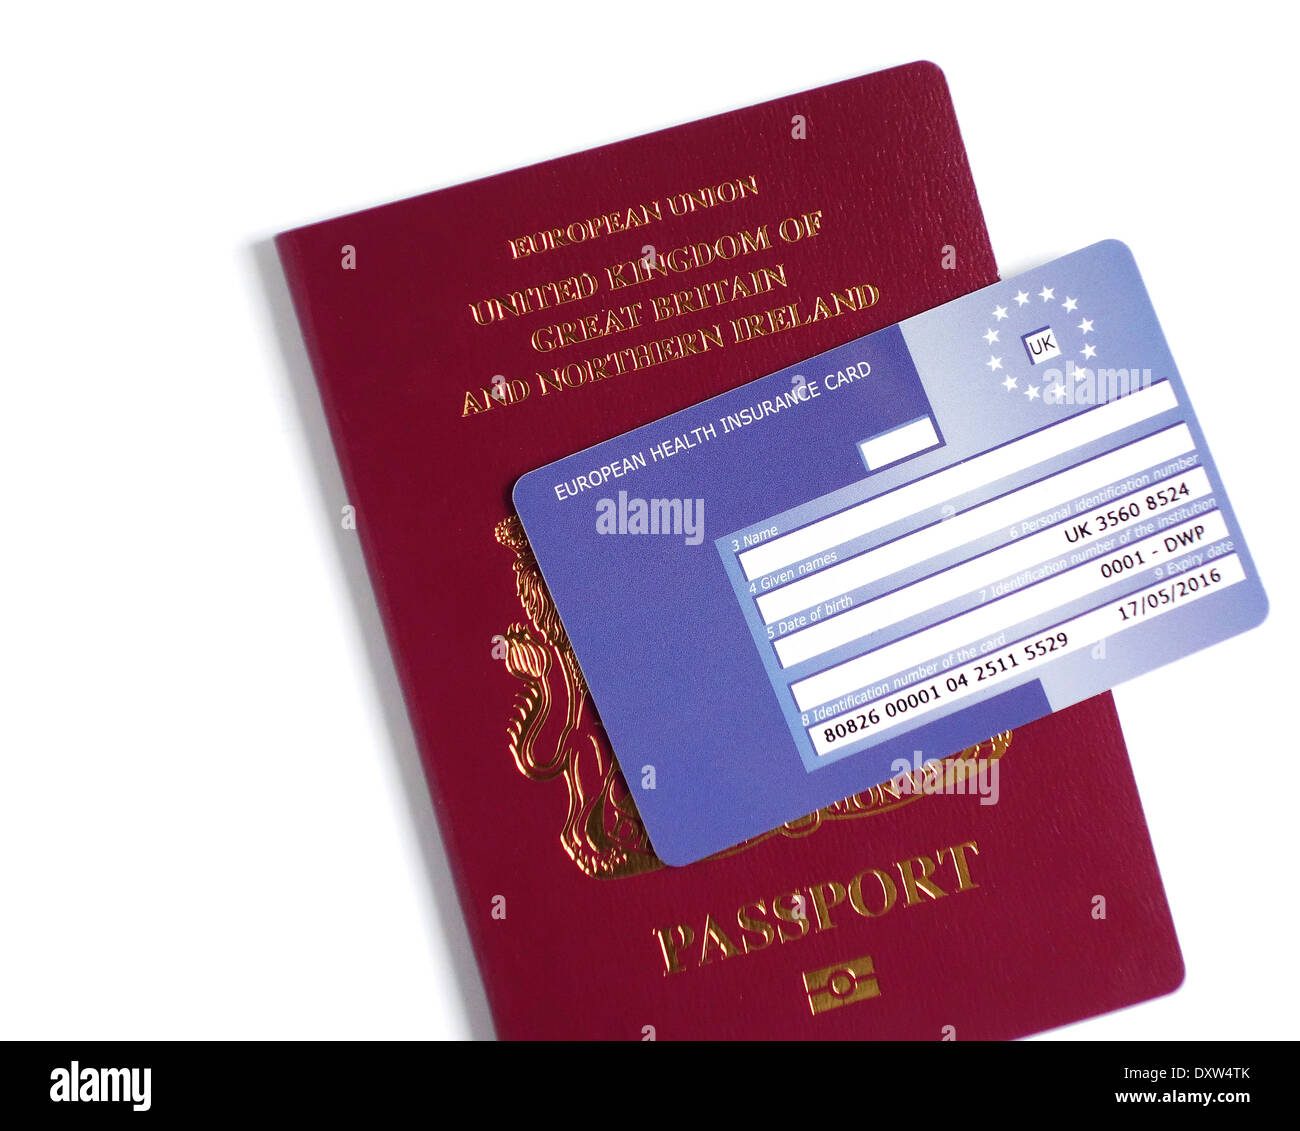 Carte Assurance Maladie Royaume Uni.Passeport Et Carte D Assurance Maladie Au Royaume Uni Banque